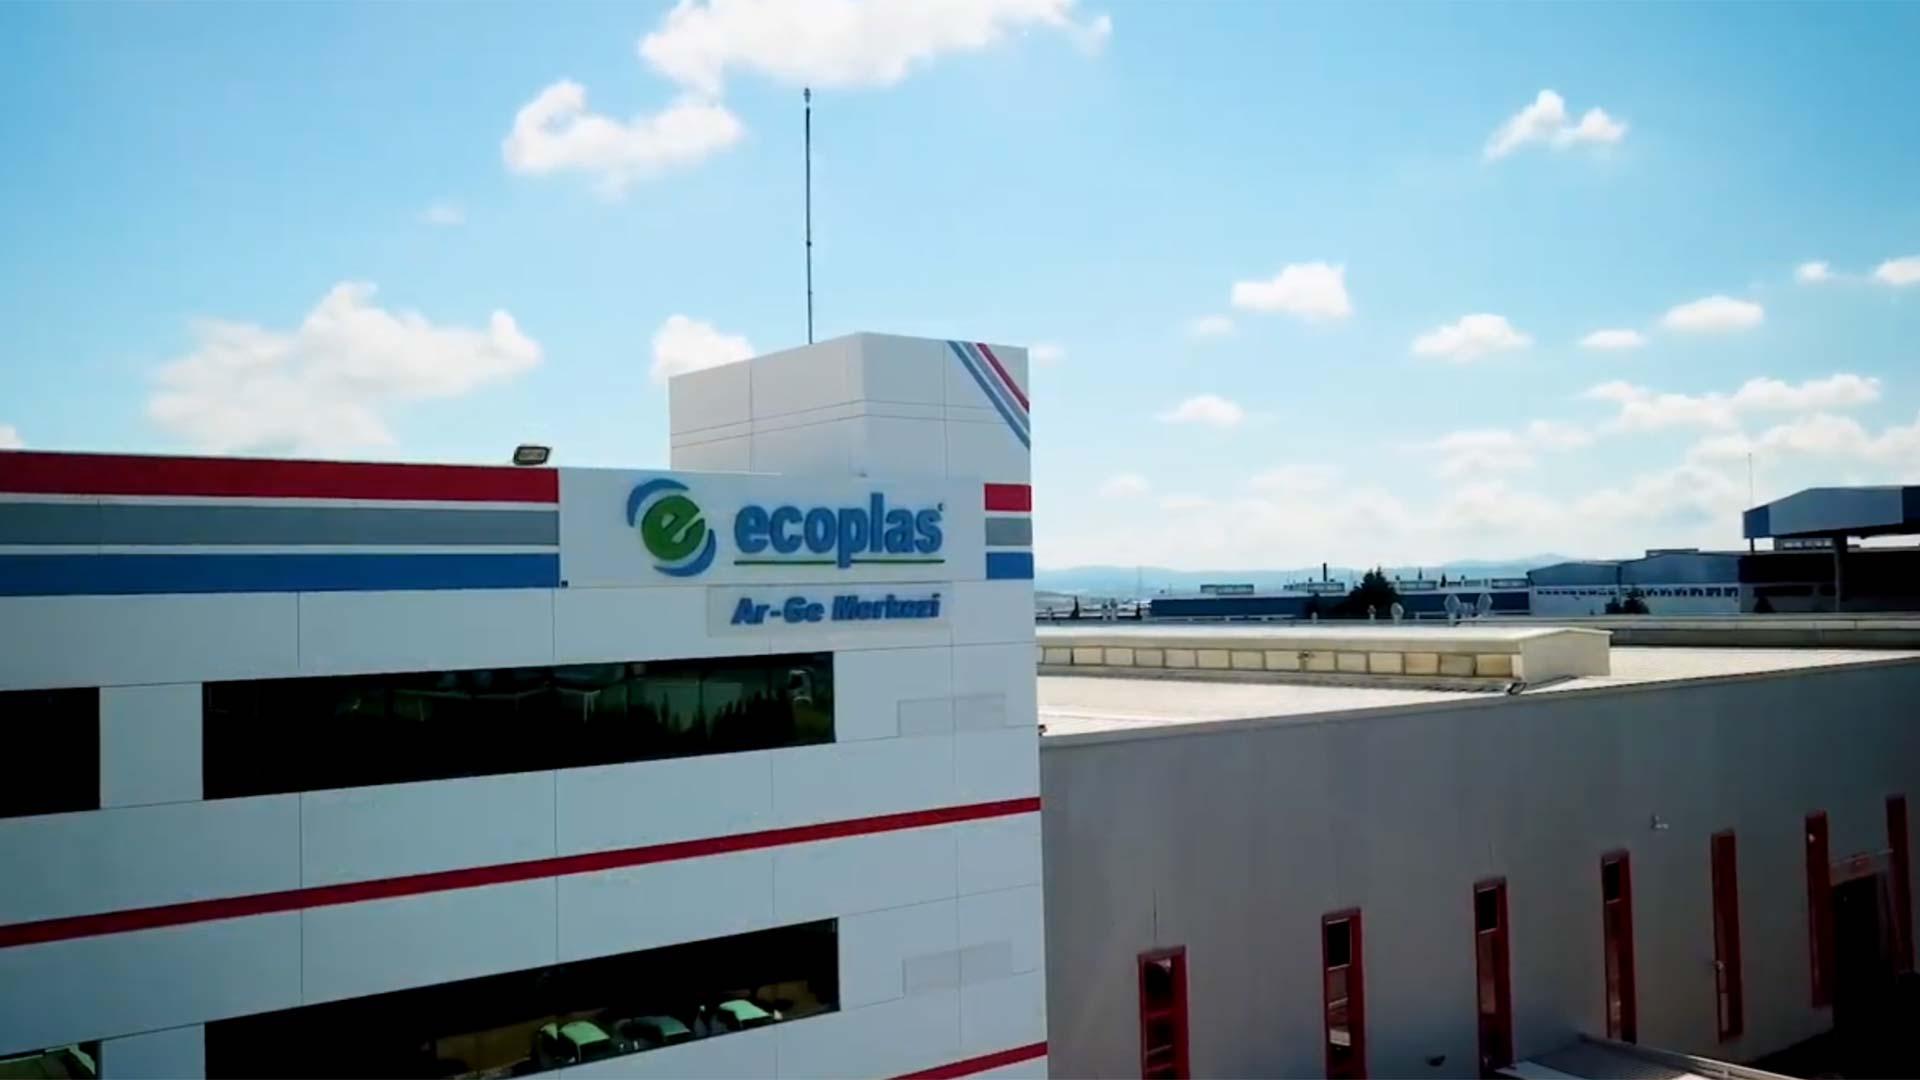 Ecoplas Otomotiv